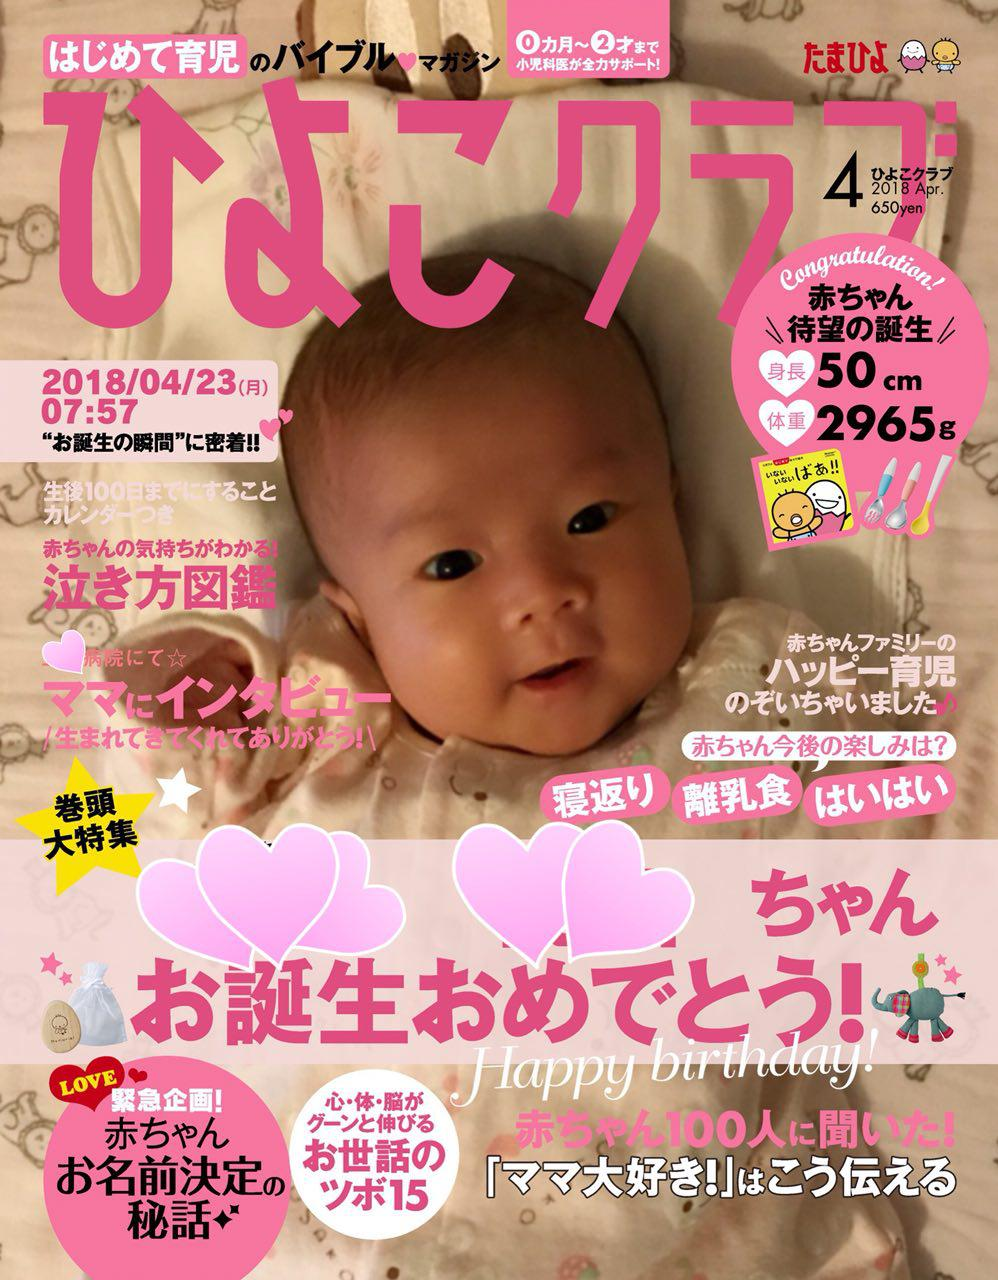 photo_2018-05-30_23-05-38.jpg